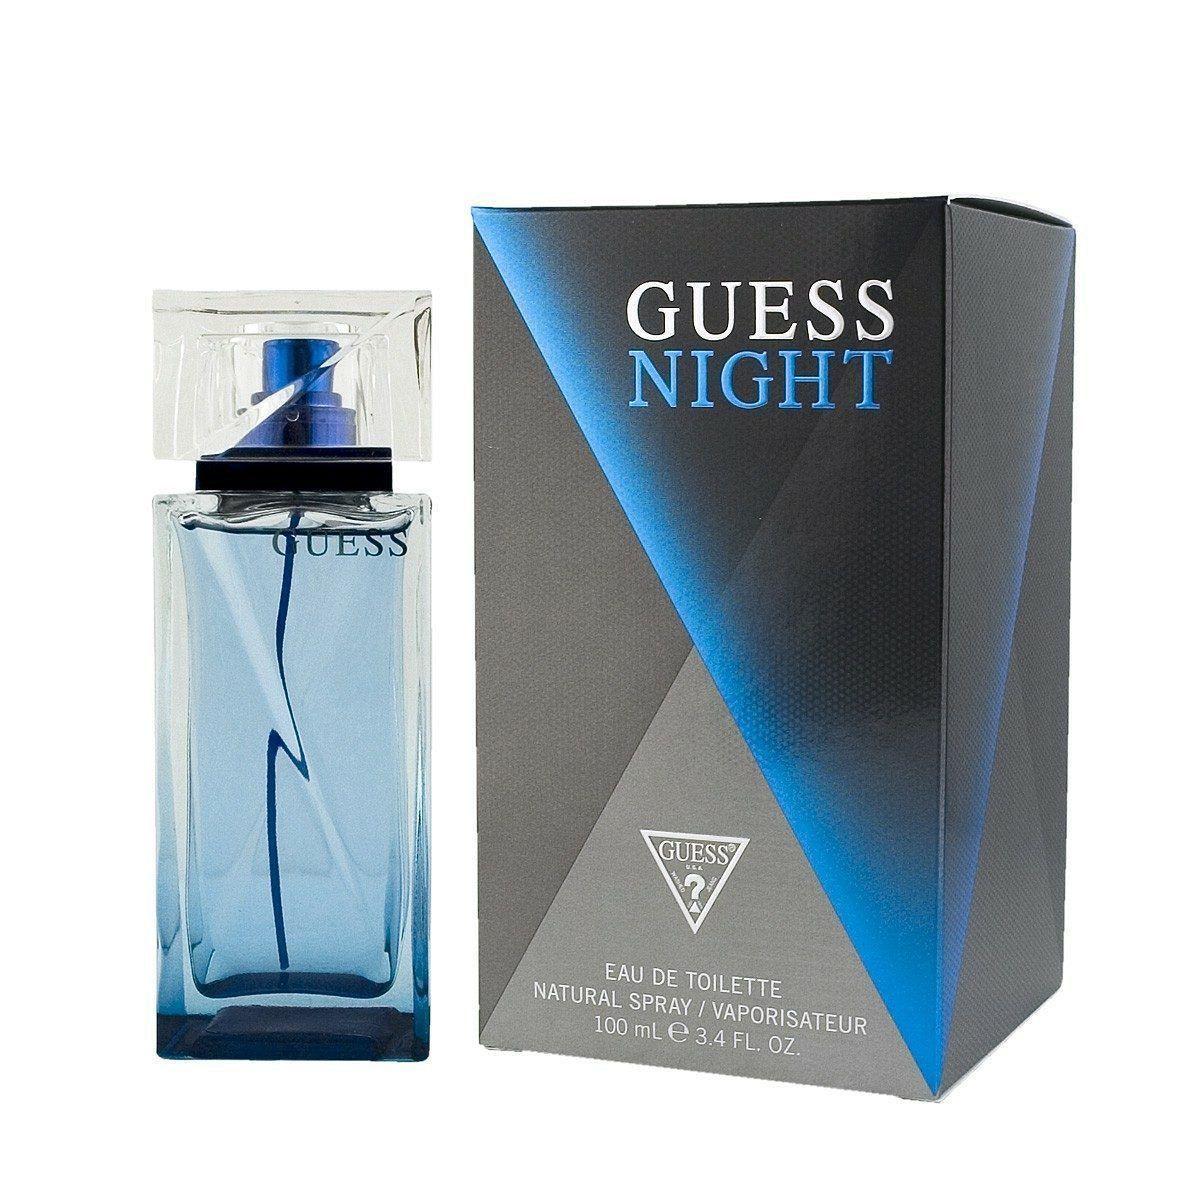 Perfumes Guess Para Hombre en Oferta ENVIO GRATIS desde